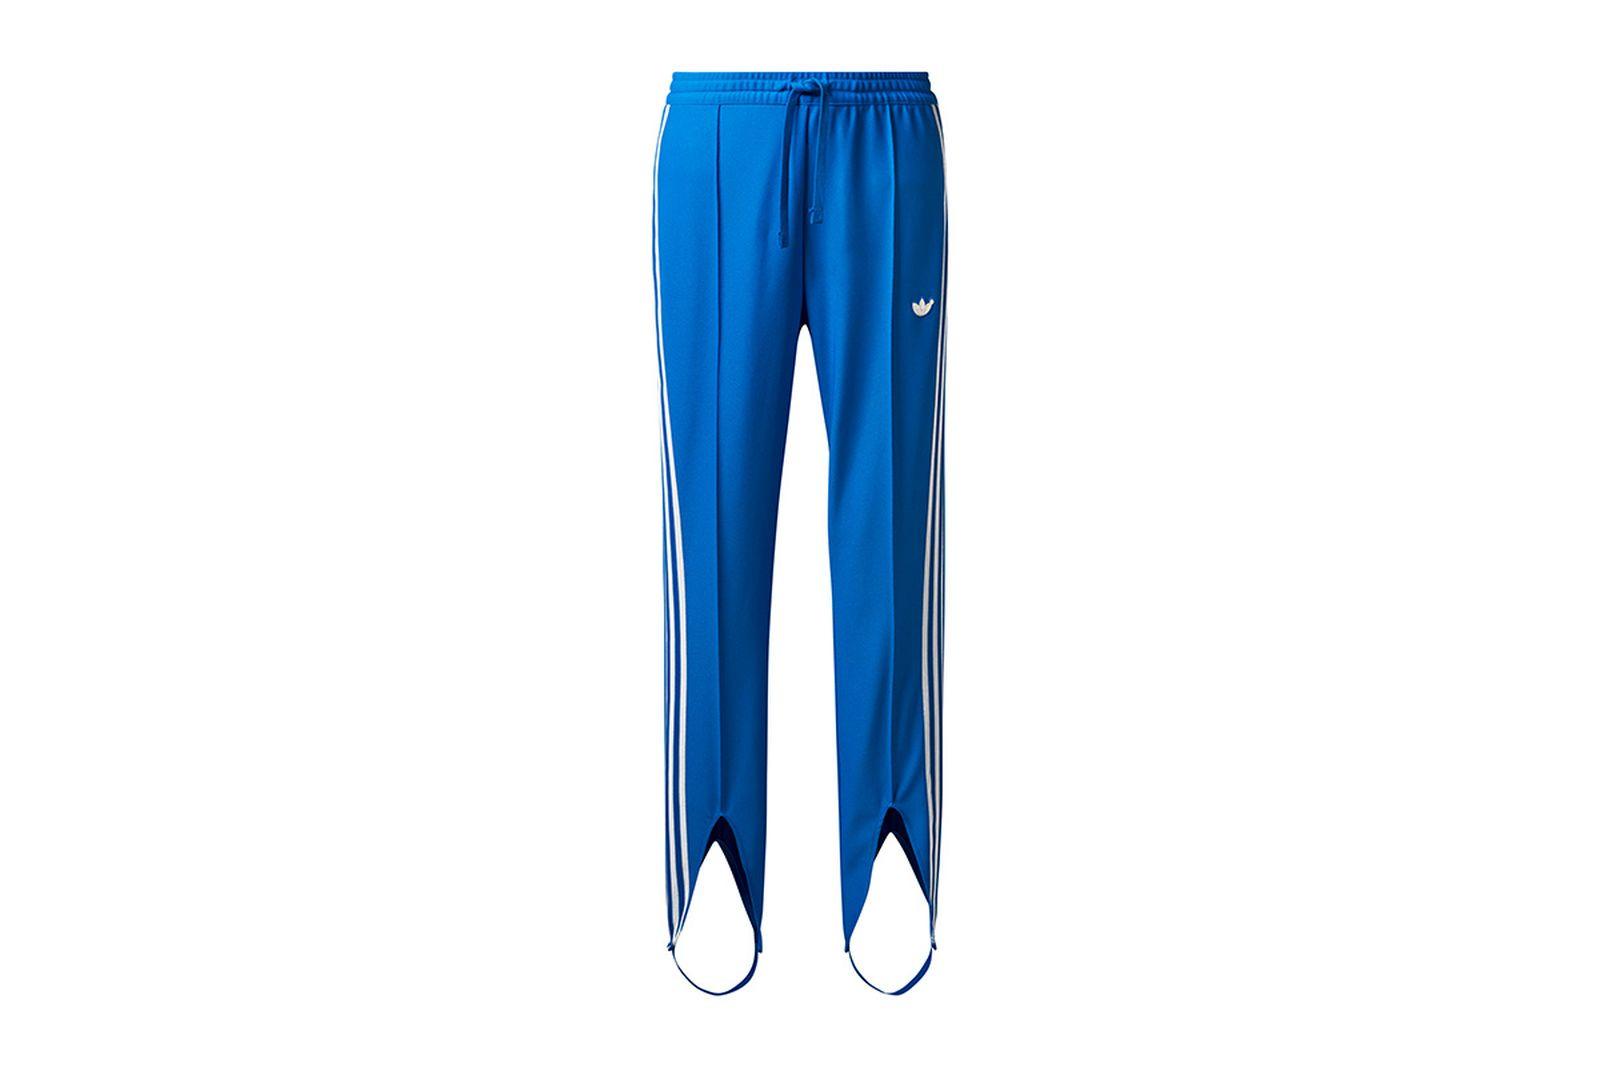 adidas-originals-blue-version-release-info-20